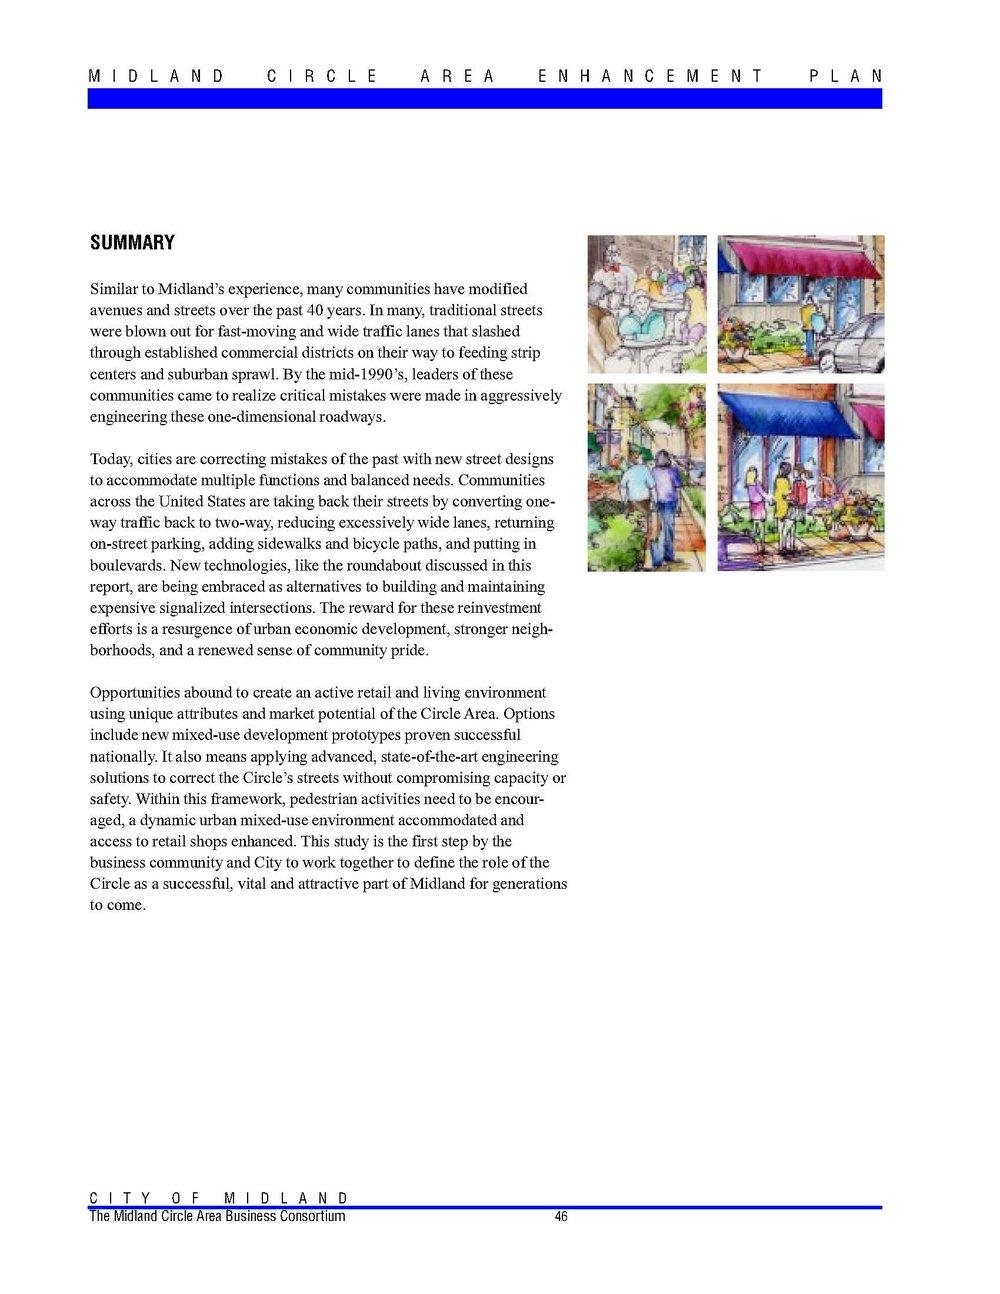 Ashman Circle Enhancement Plan_Page_48.jpg